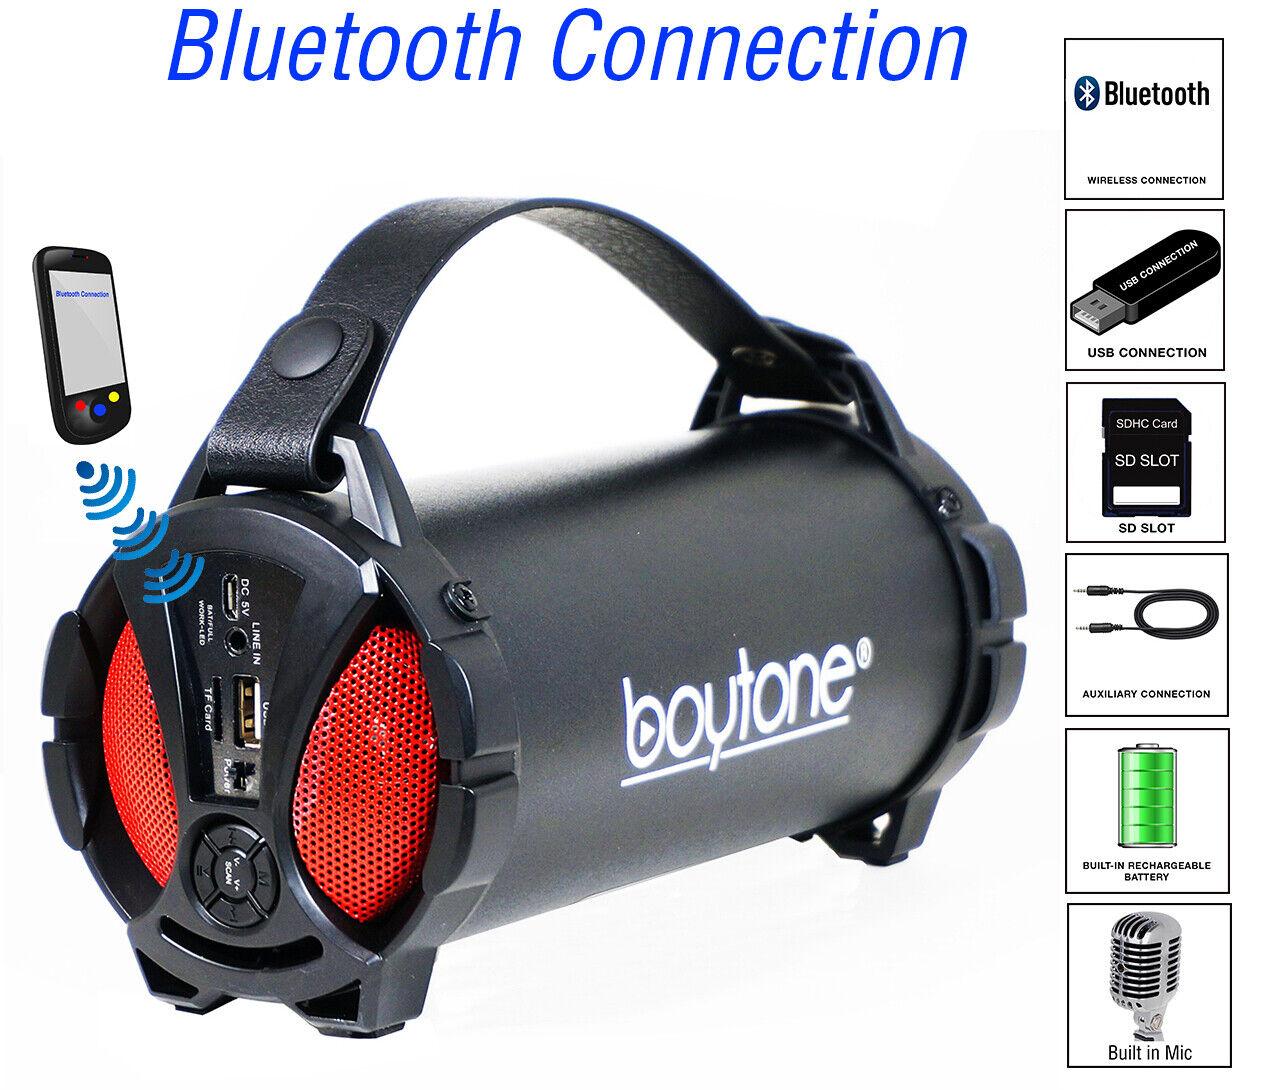 Boytone BT-38RD Portable Bluetooth Indoor/Outdoor Speaker 2.